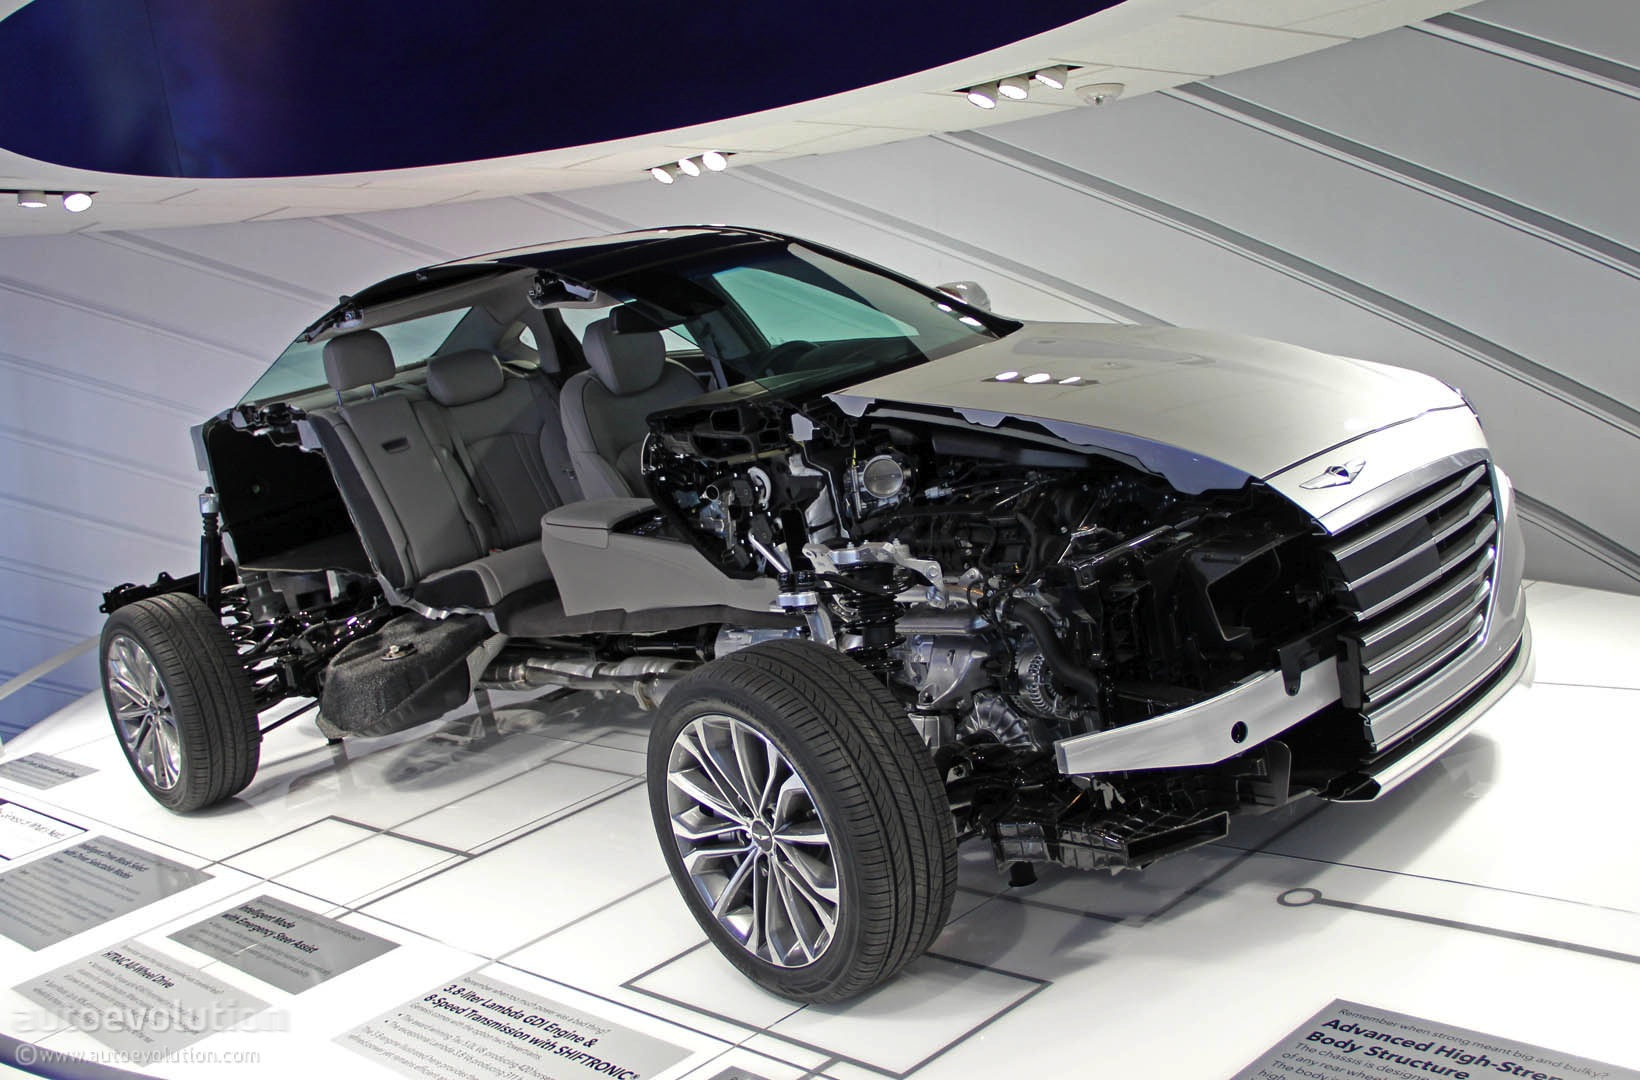 Audi Auto Gallery >> 2015 Hyundai Genesis Luxury Sedan Revealed in Detroit [Live Photos] - autoevolution